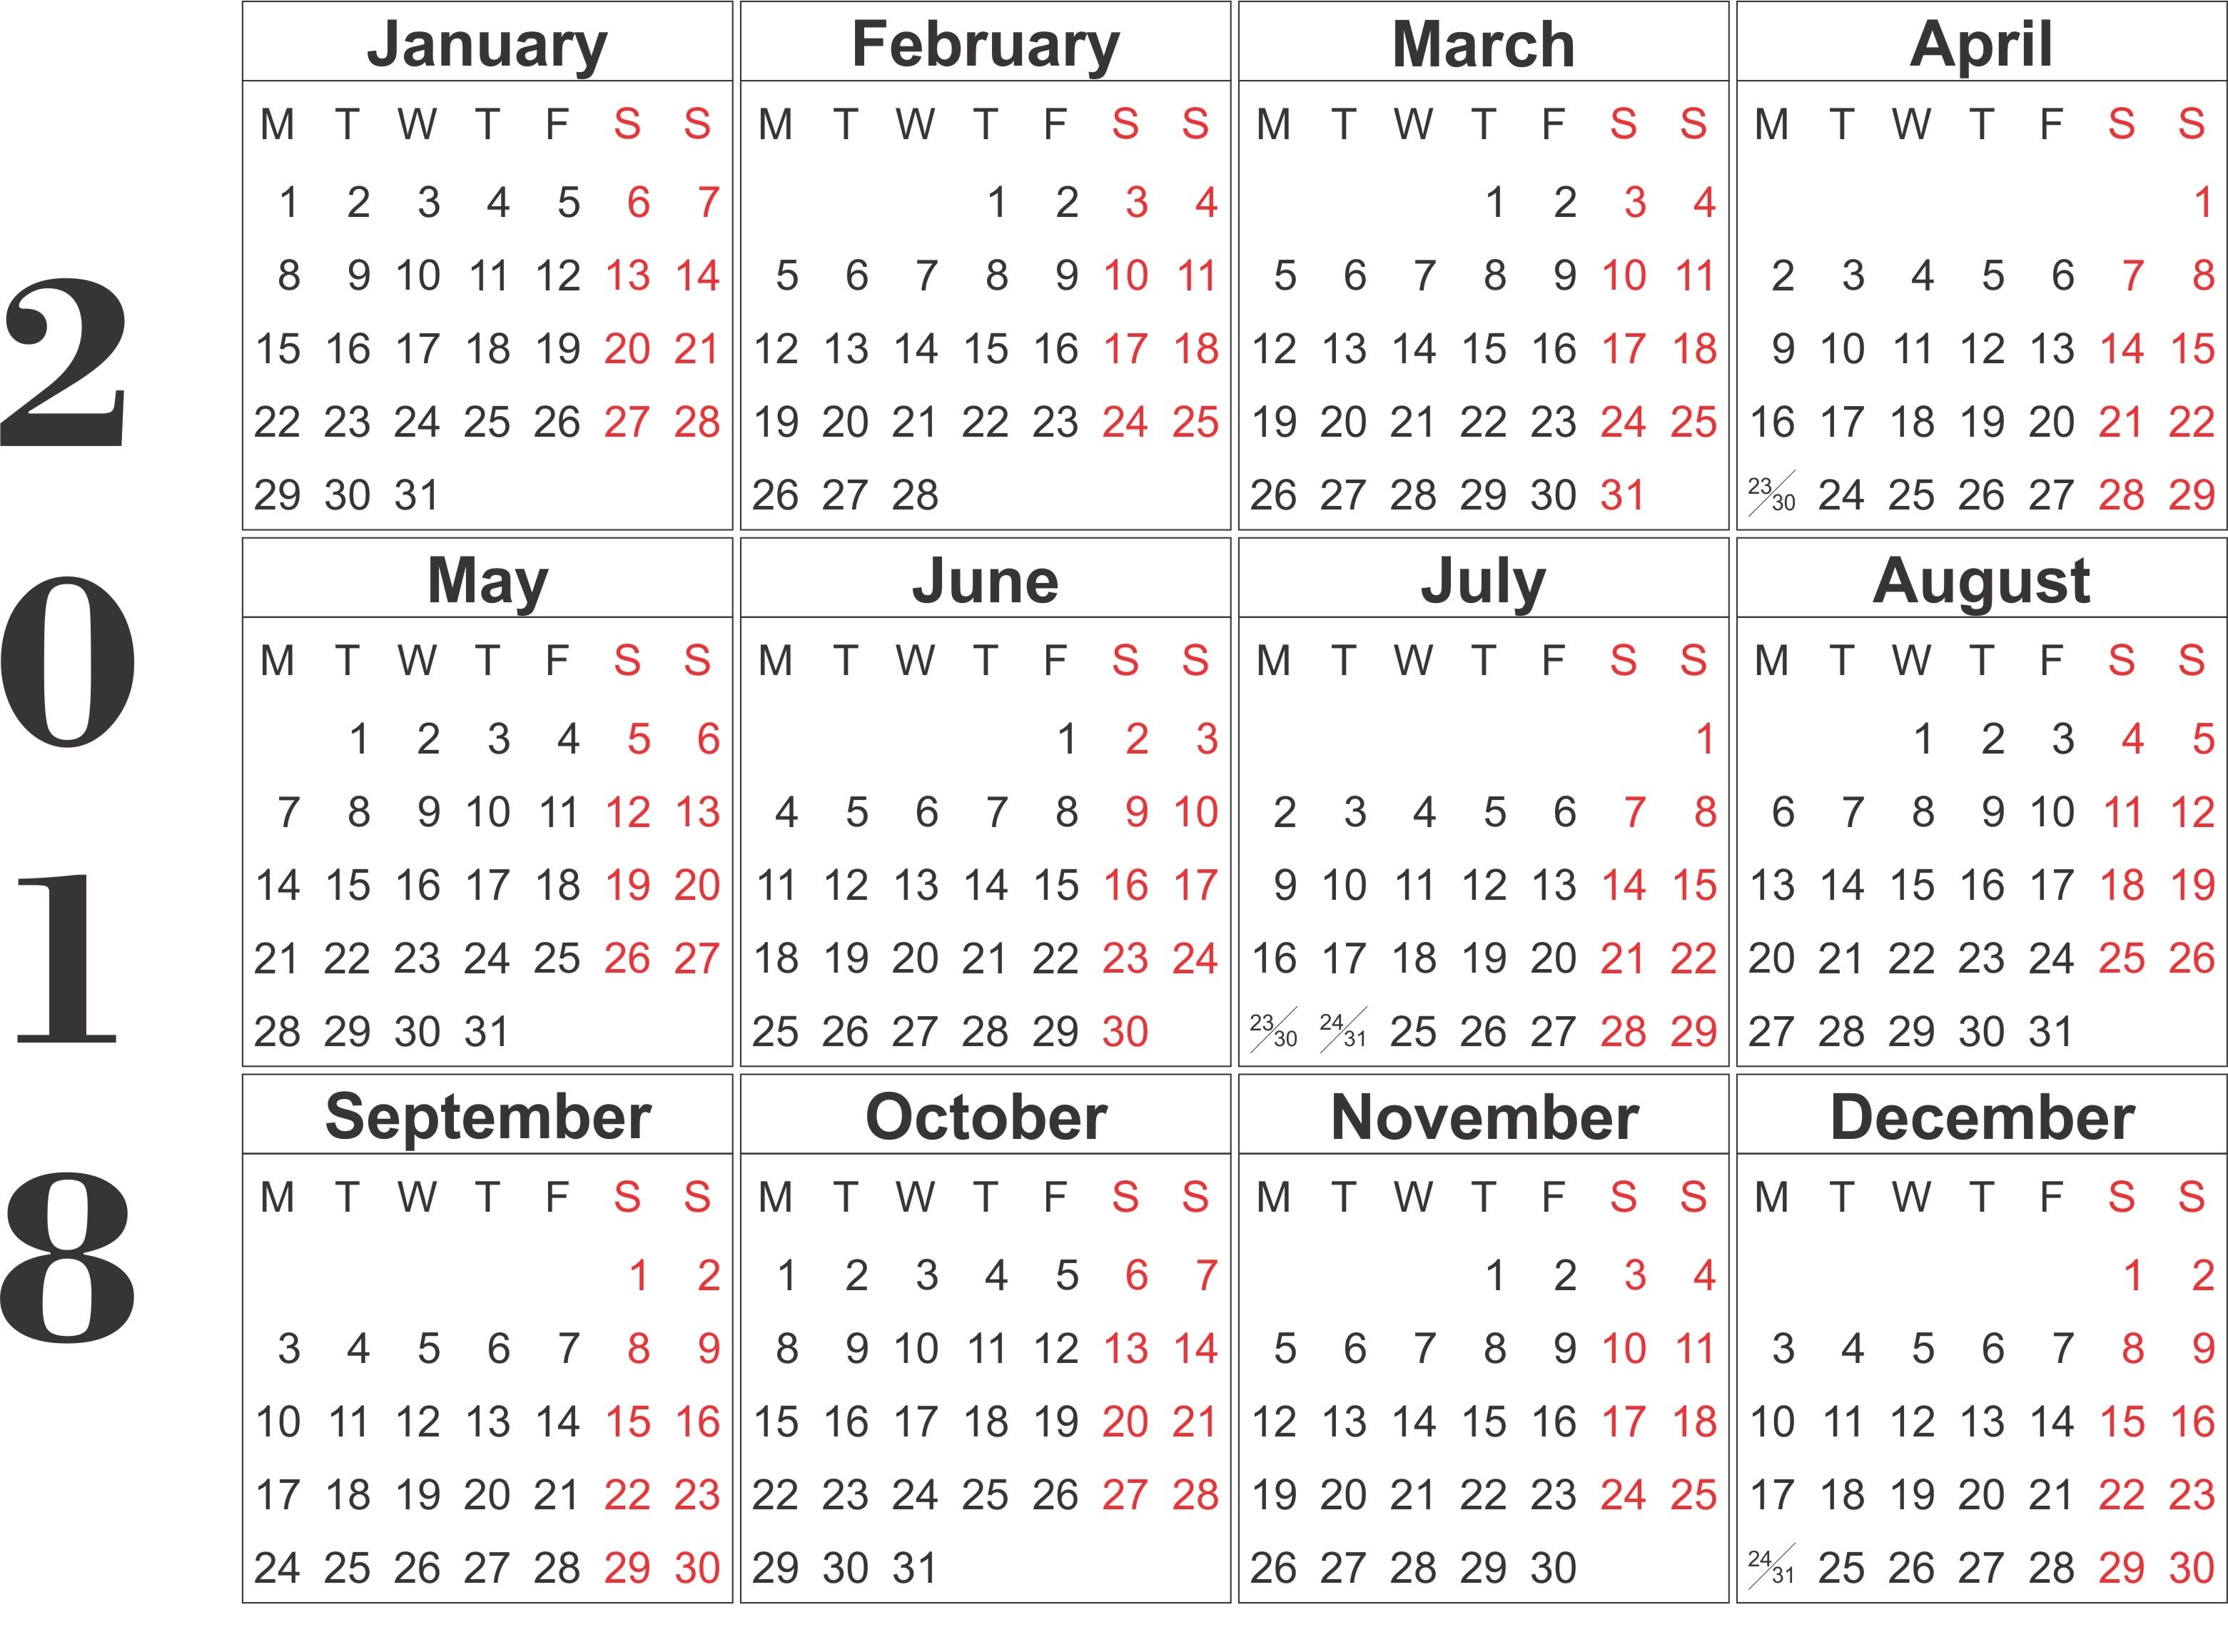 blank calendar 2018 yearly printable calendar Free Printable 12 Month Calendar 2018 erdferdf